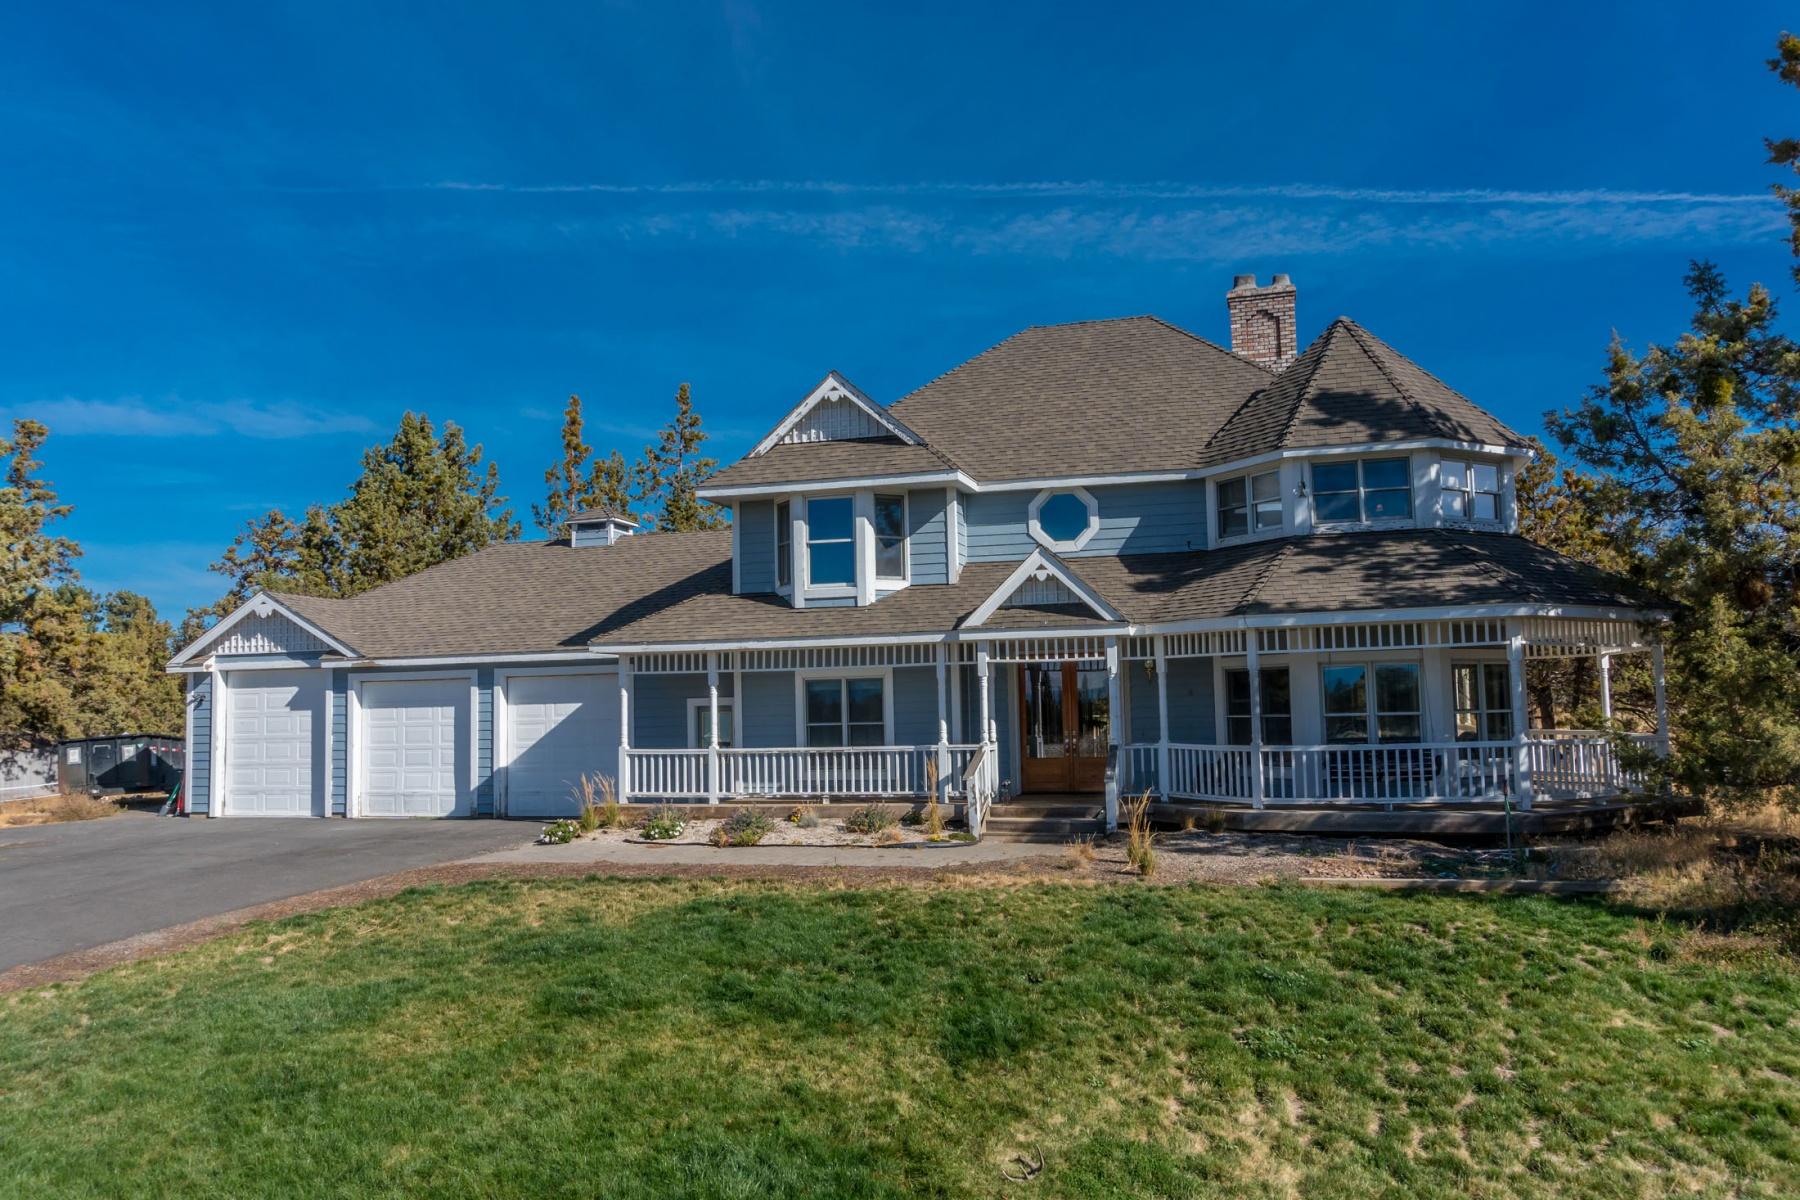 Moradia para Venda às Horse Property Possible Subdivision 63070 Cole Rd Bend, Oregon, 97701 Estados Unidos